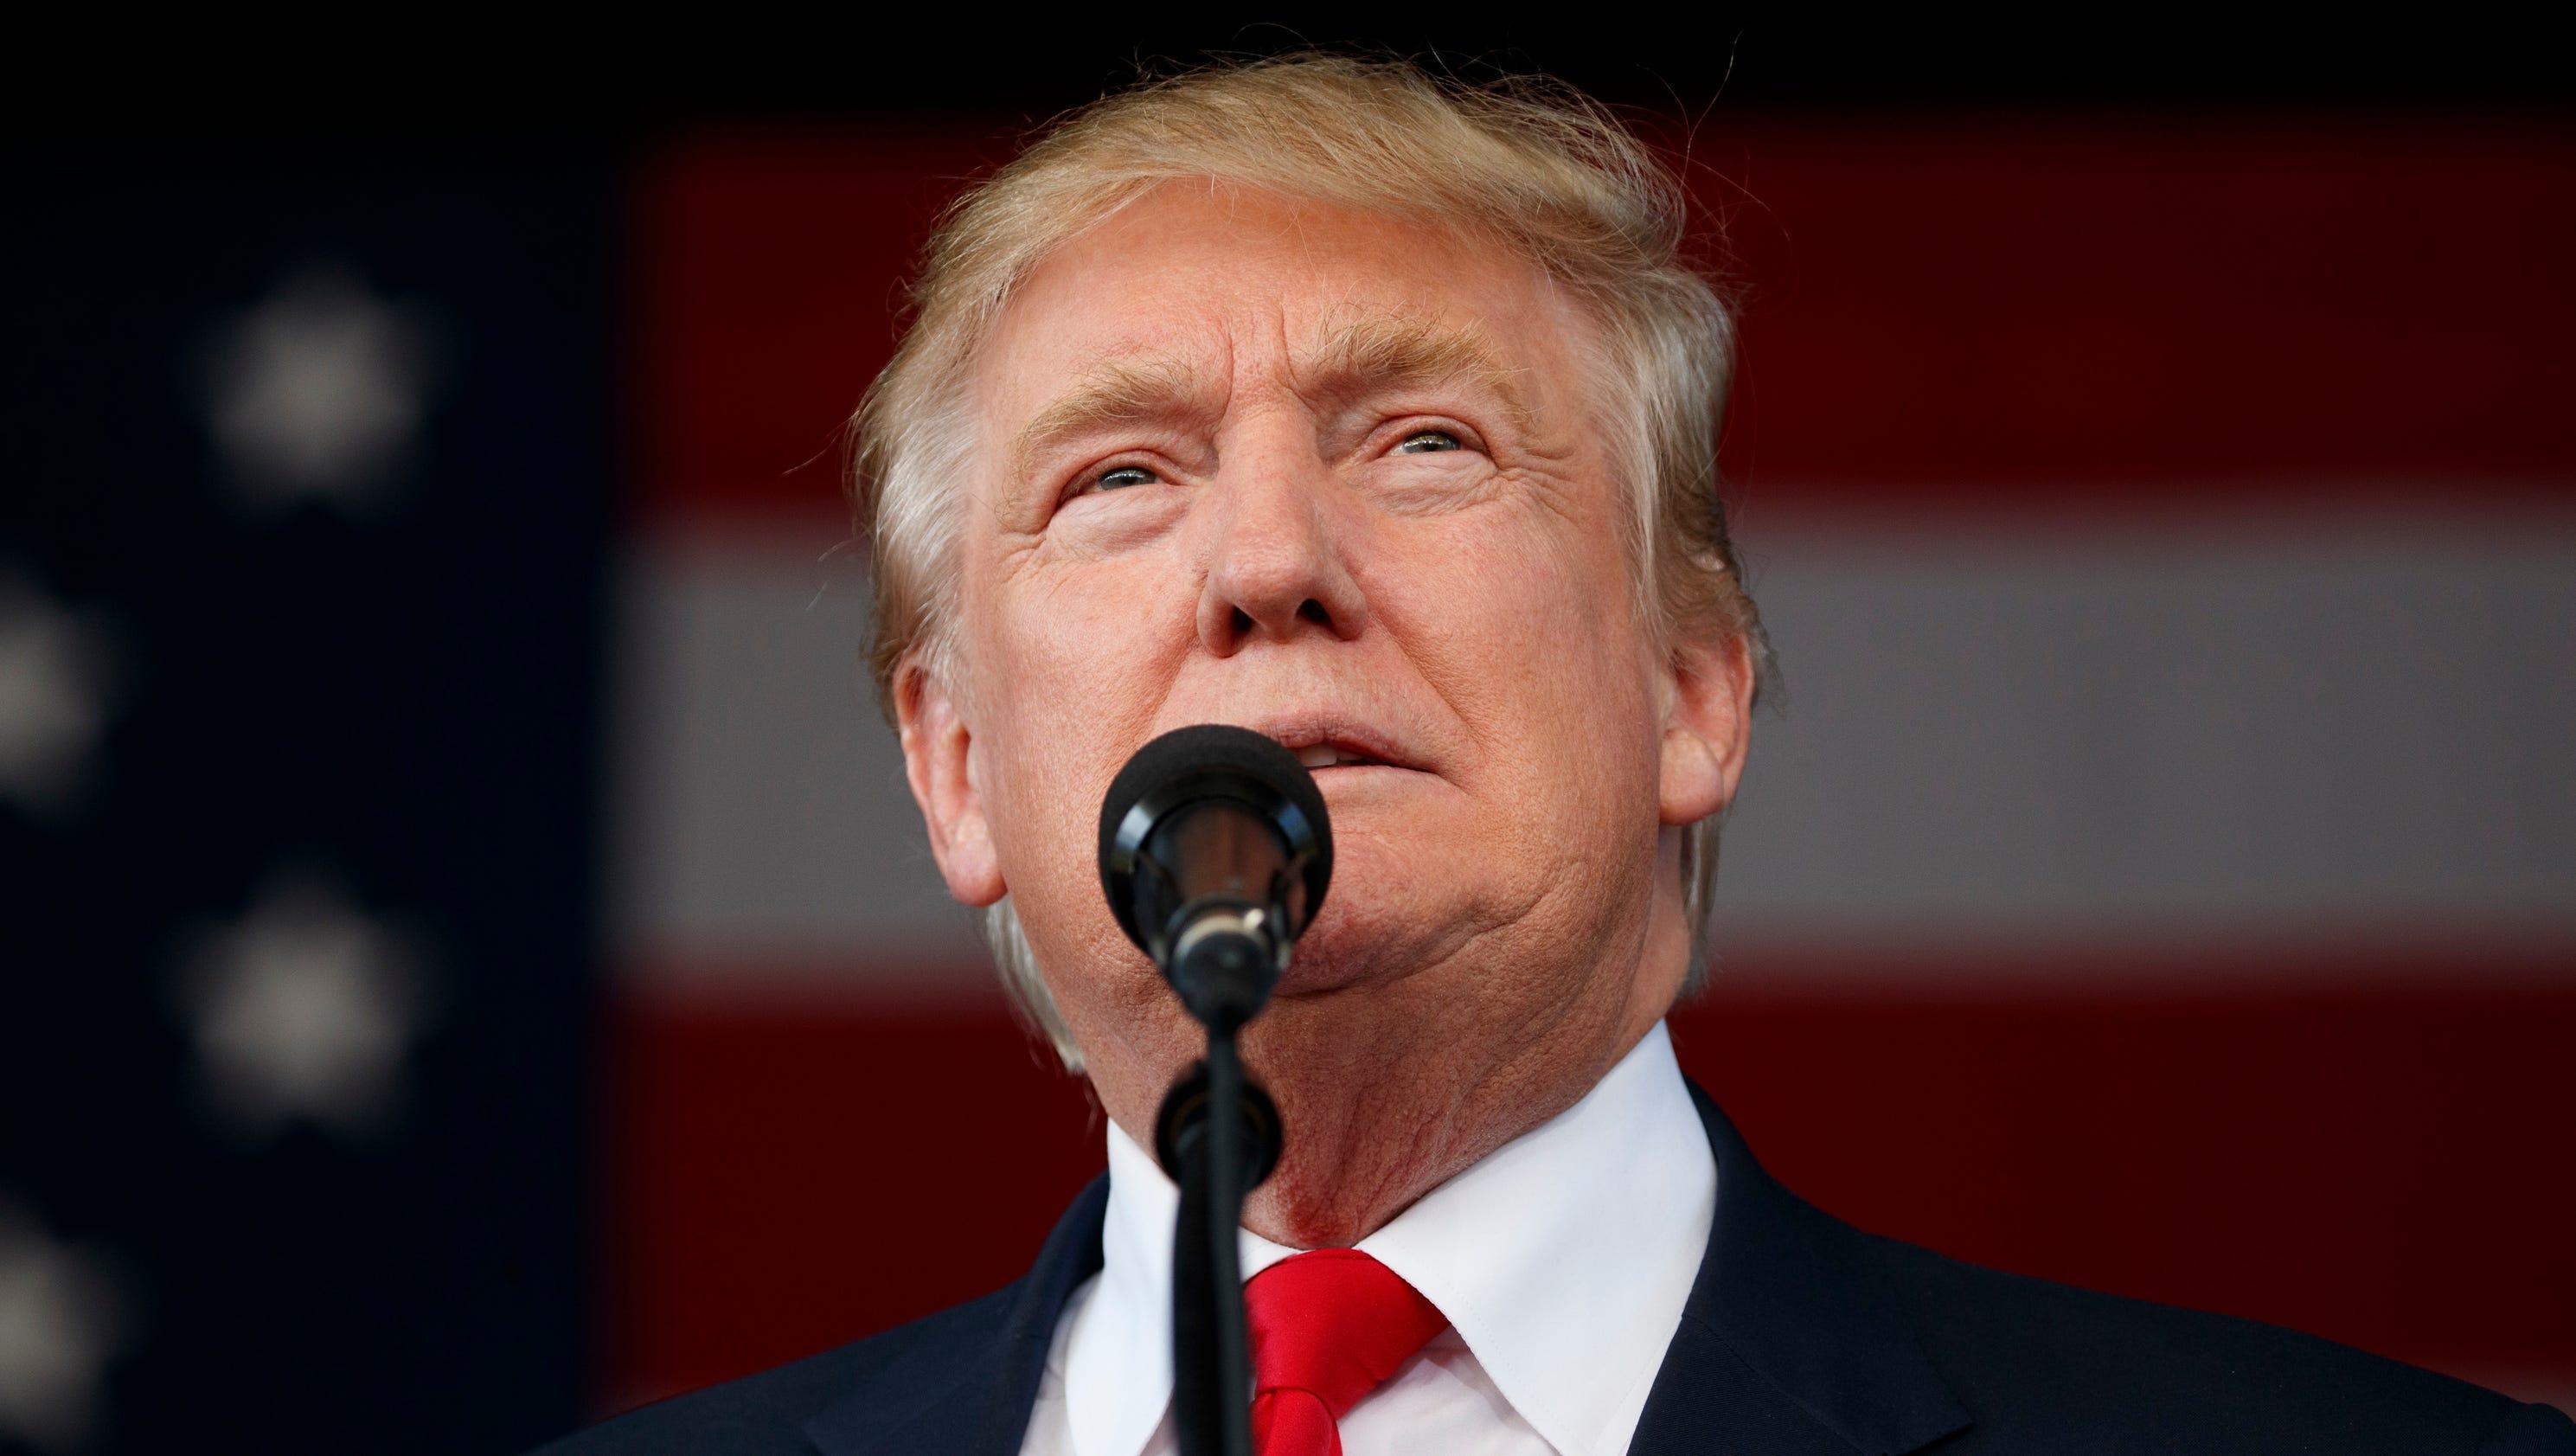 Trump: Windmills make Palm Springs look like a 'junkyard'